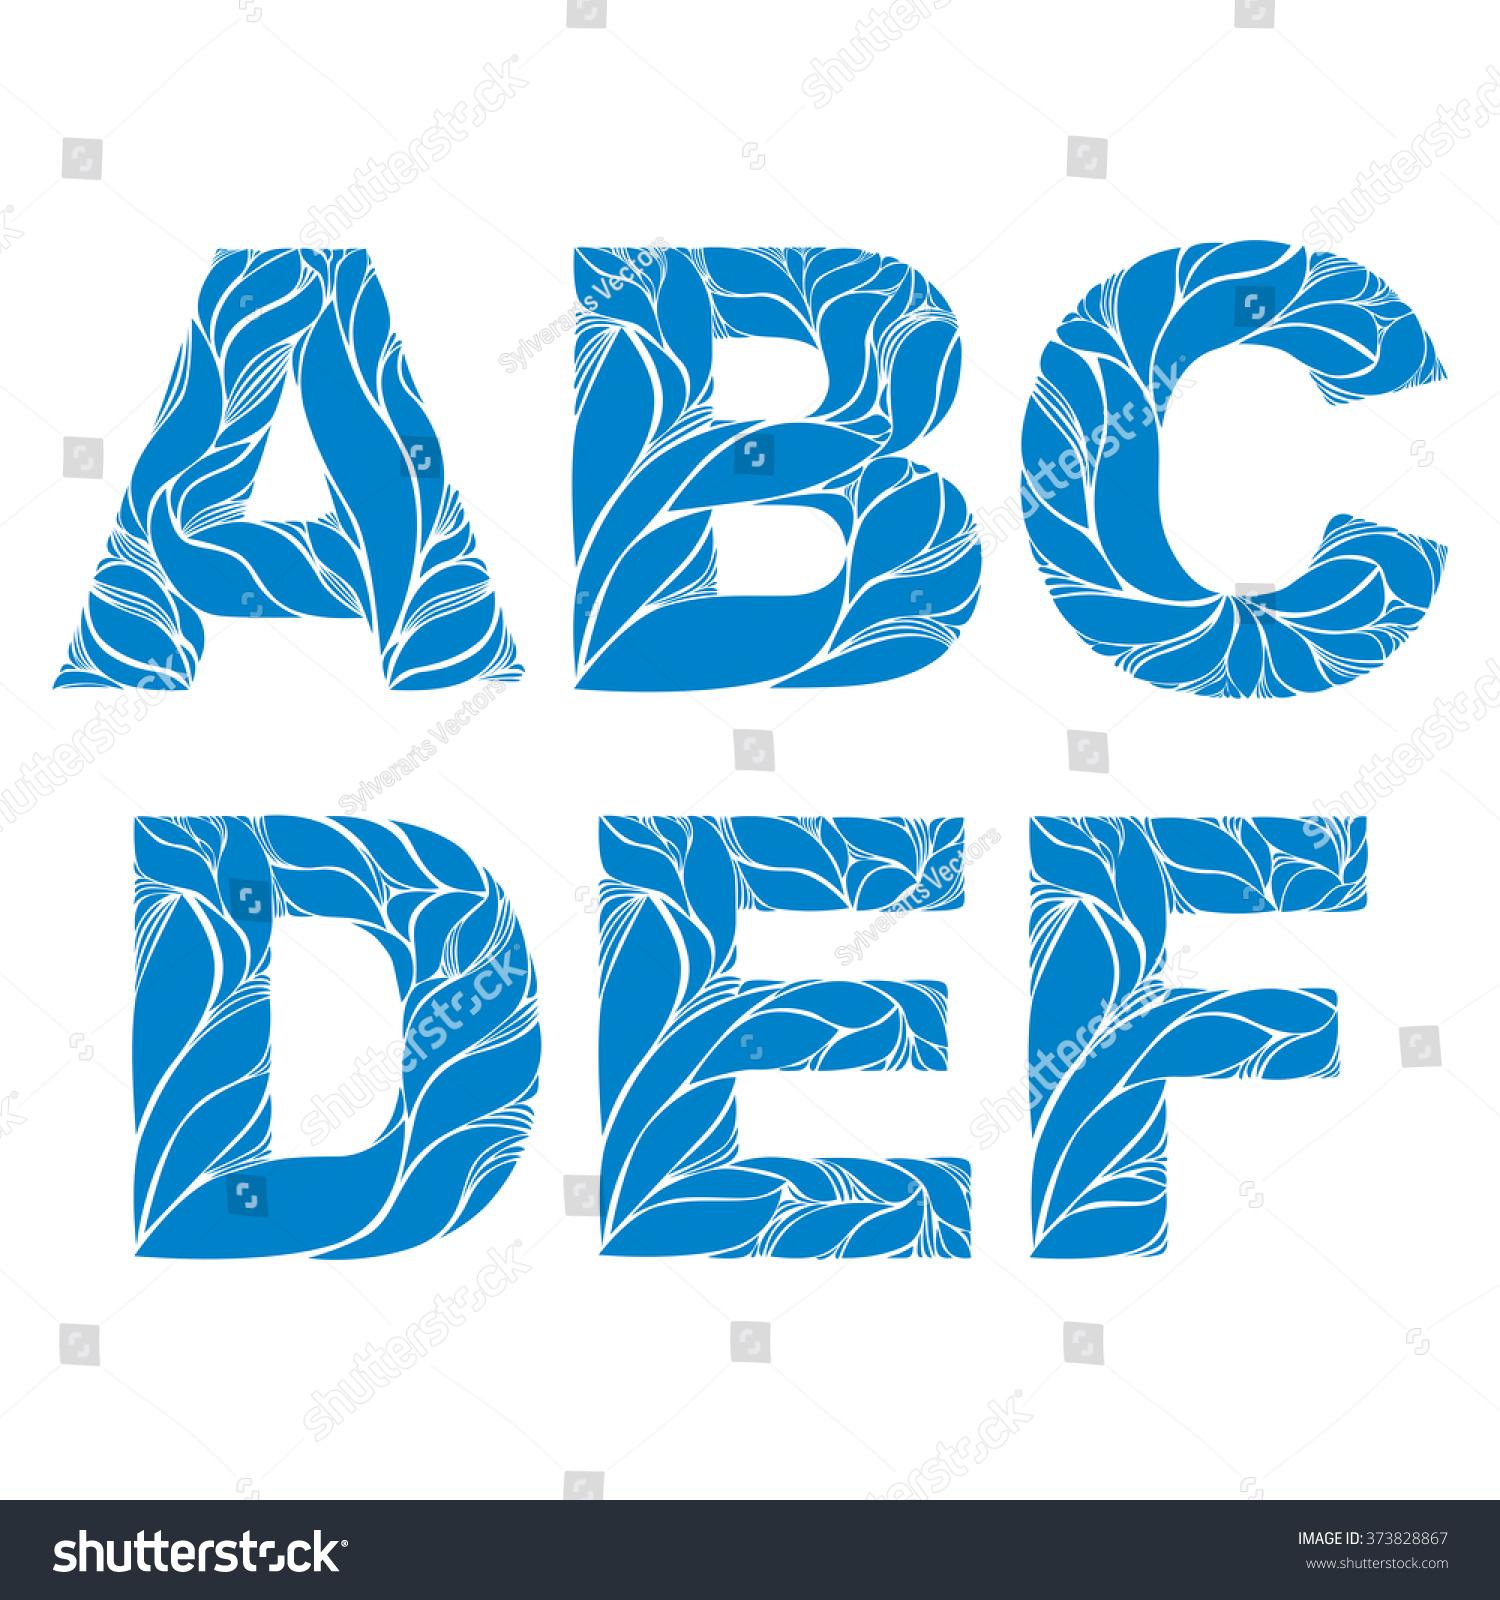 Blue Delicate Capital Letters Marine Ornament Stock Vector ...